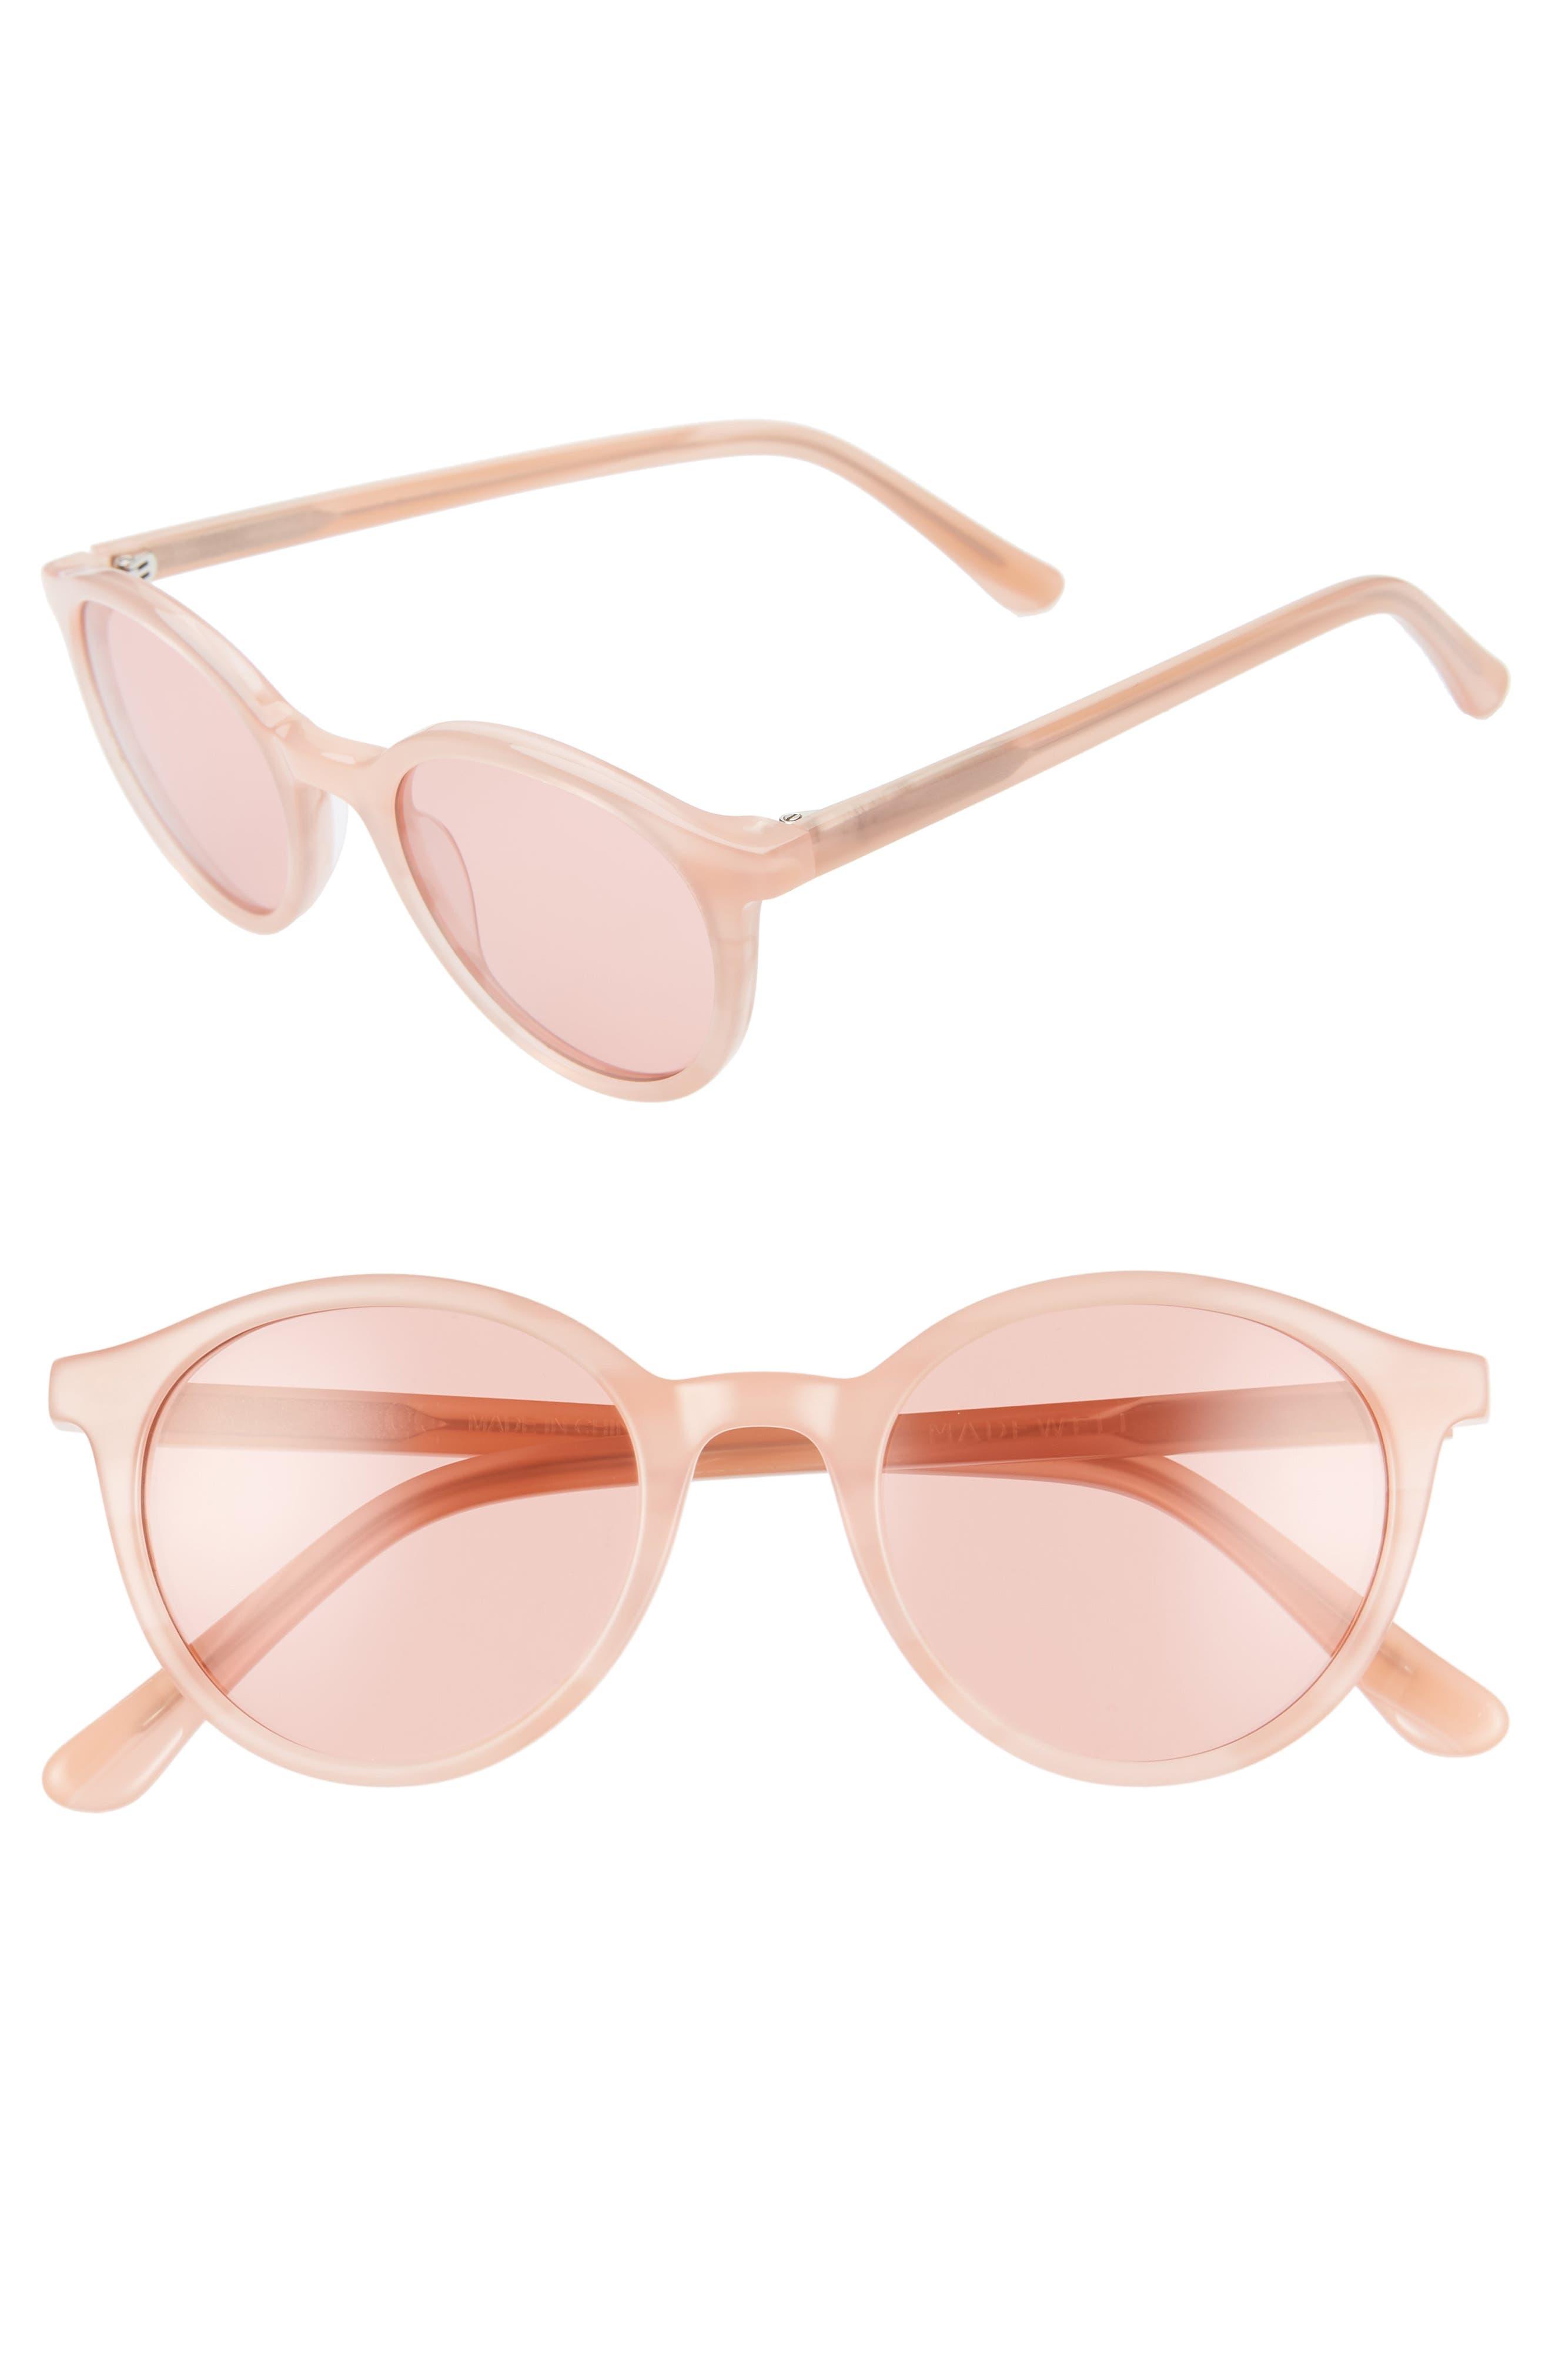 Madewell Layton 4m Round Sunglasses - Sweetheart Blush